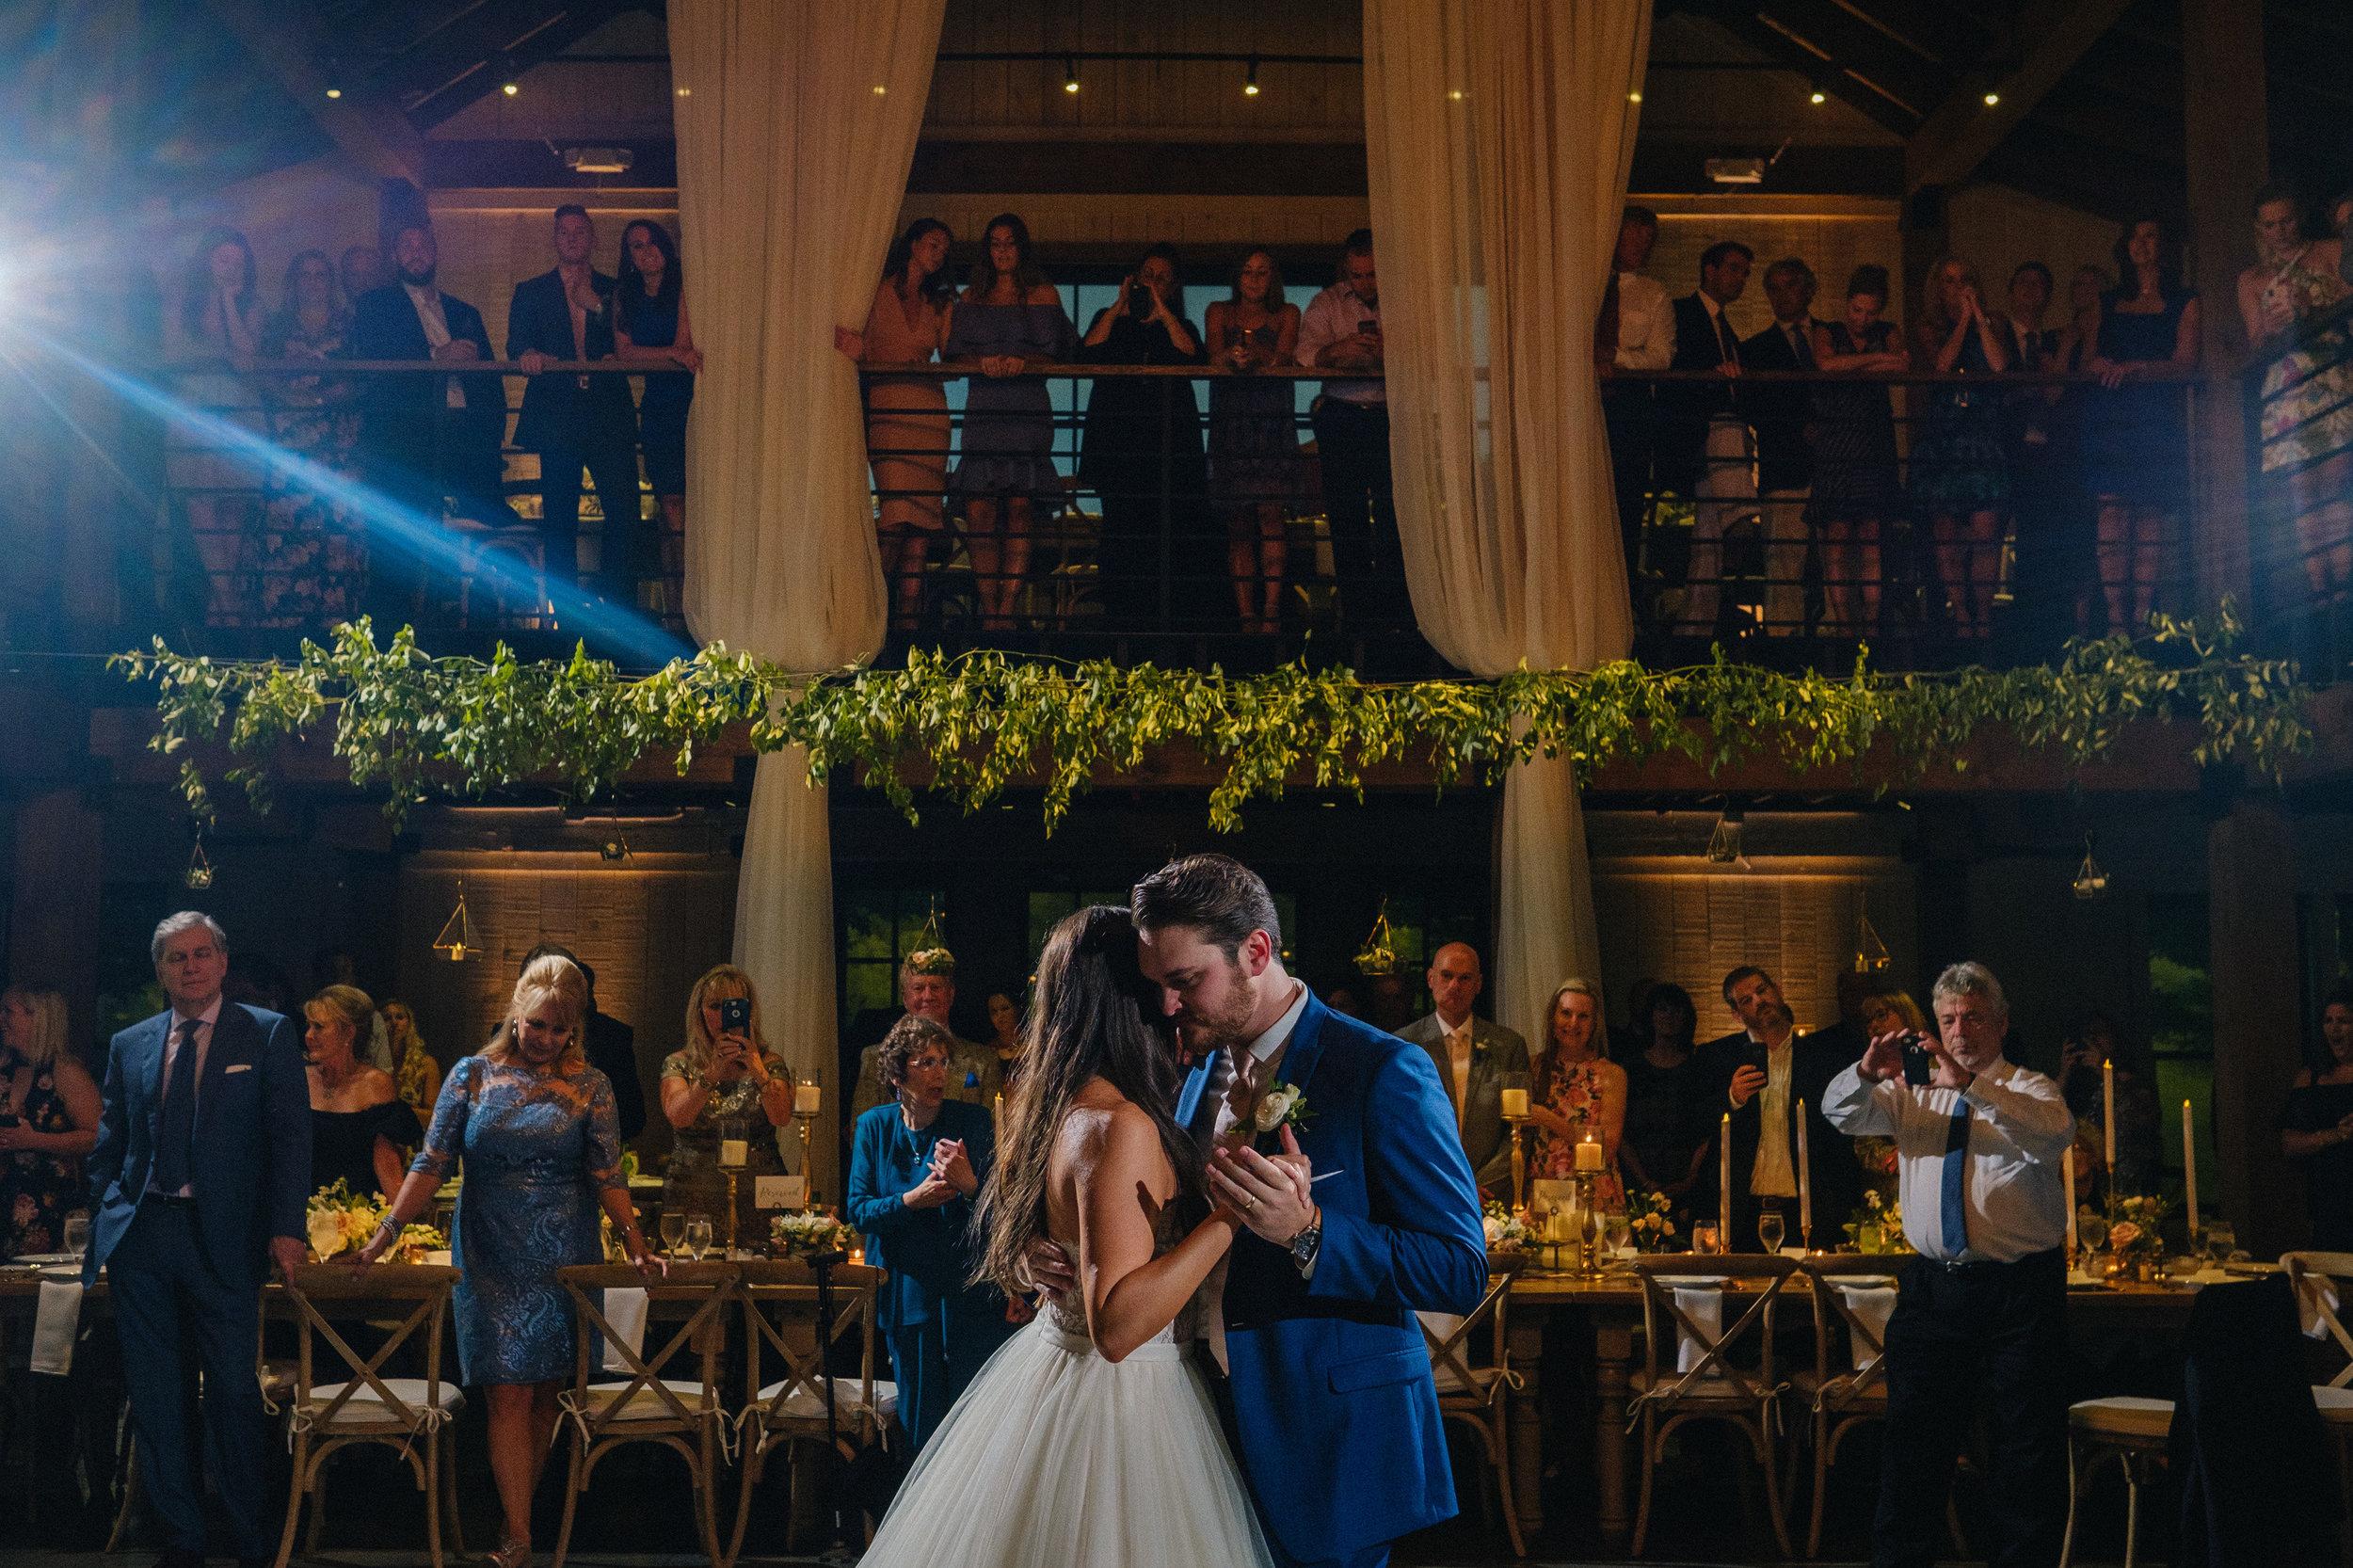 Nashville_Wedding_Photography_Mint_Springs_69.jpg